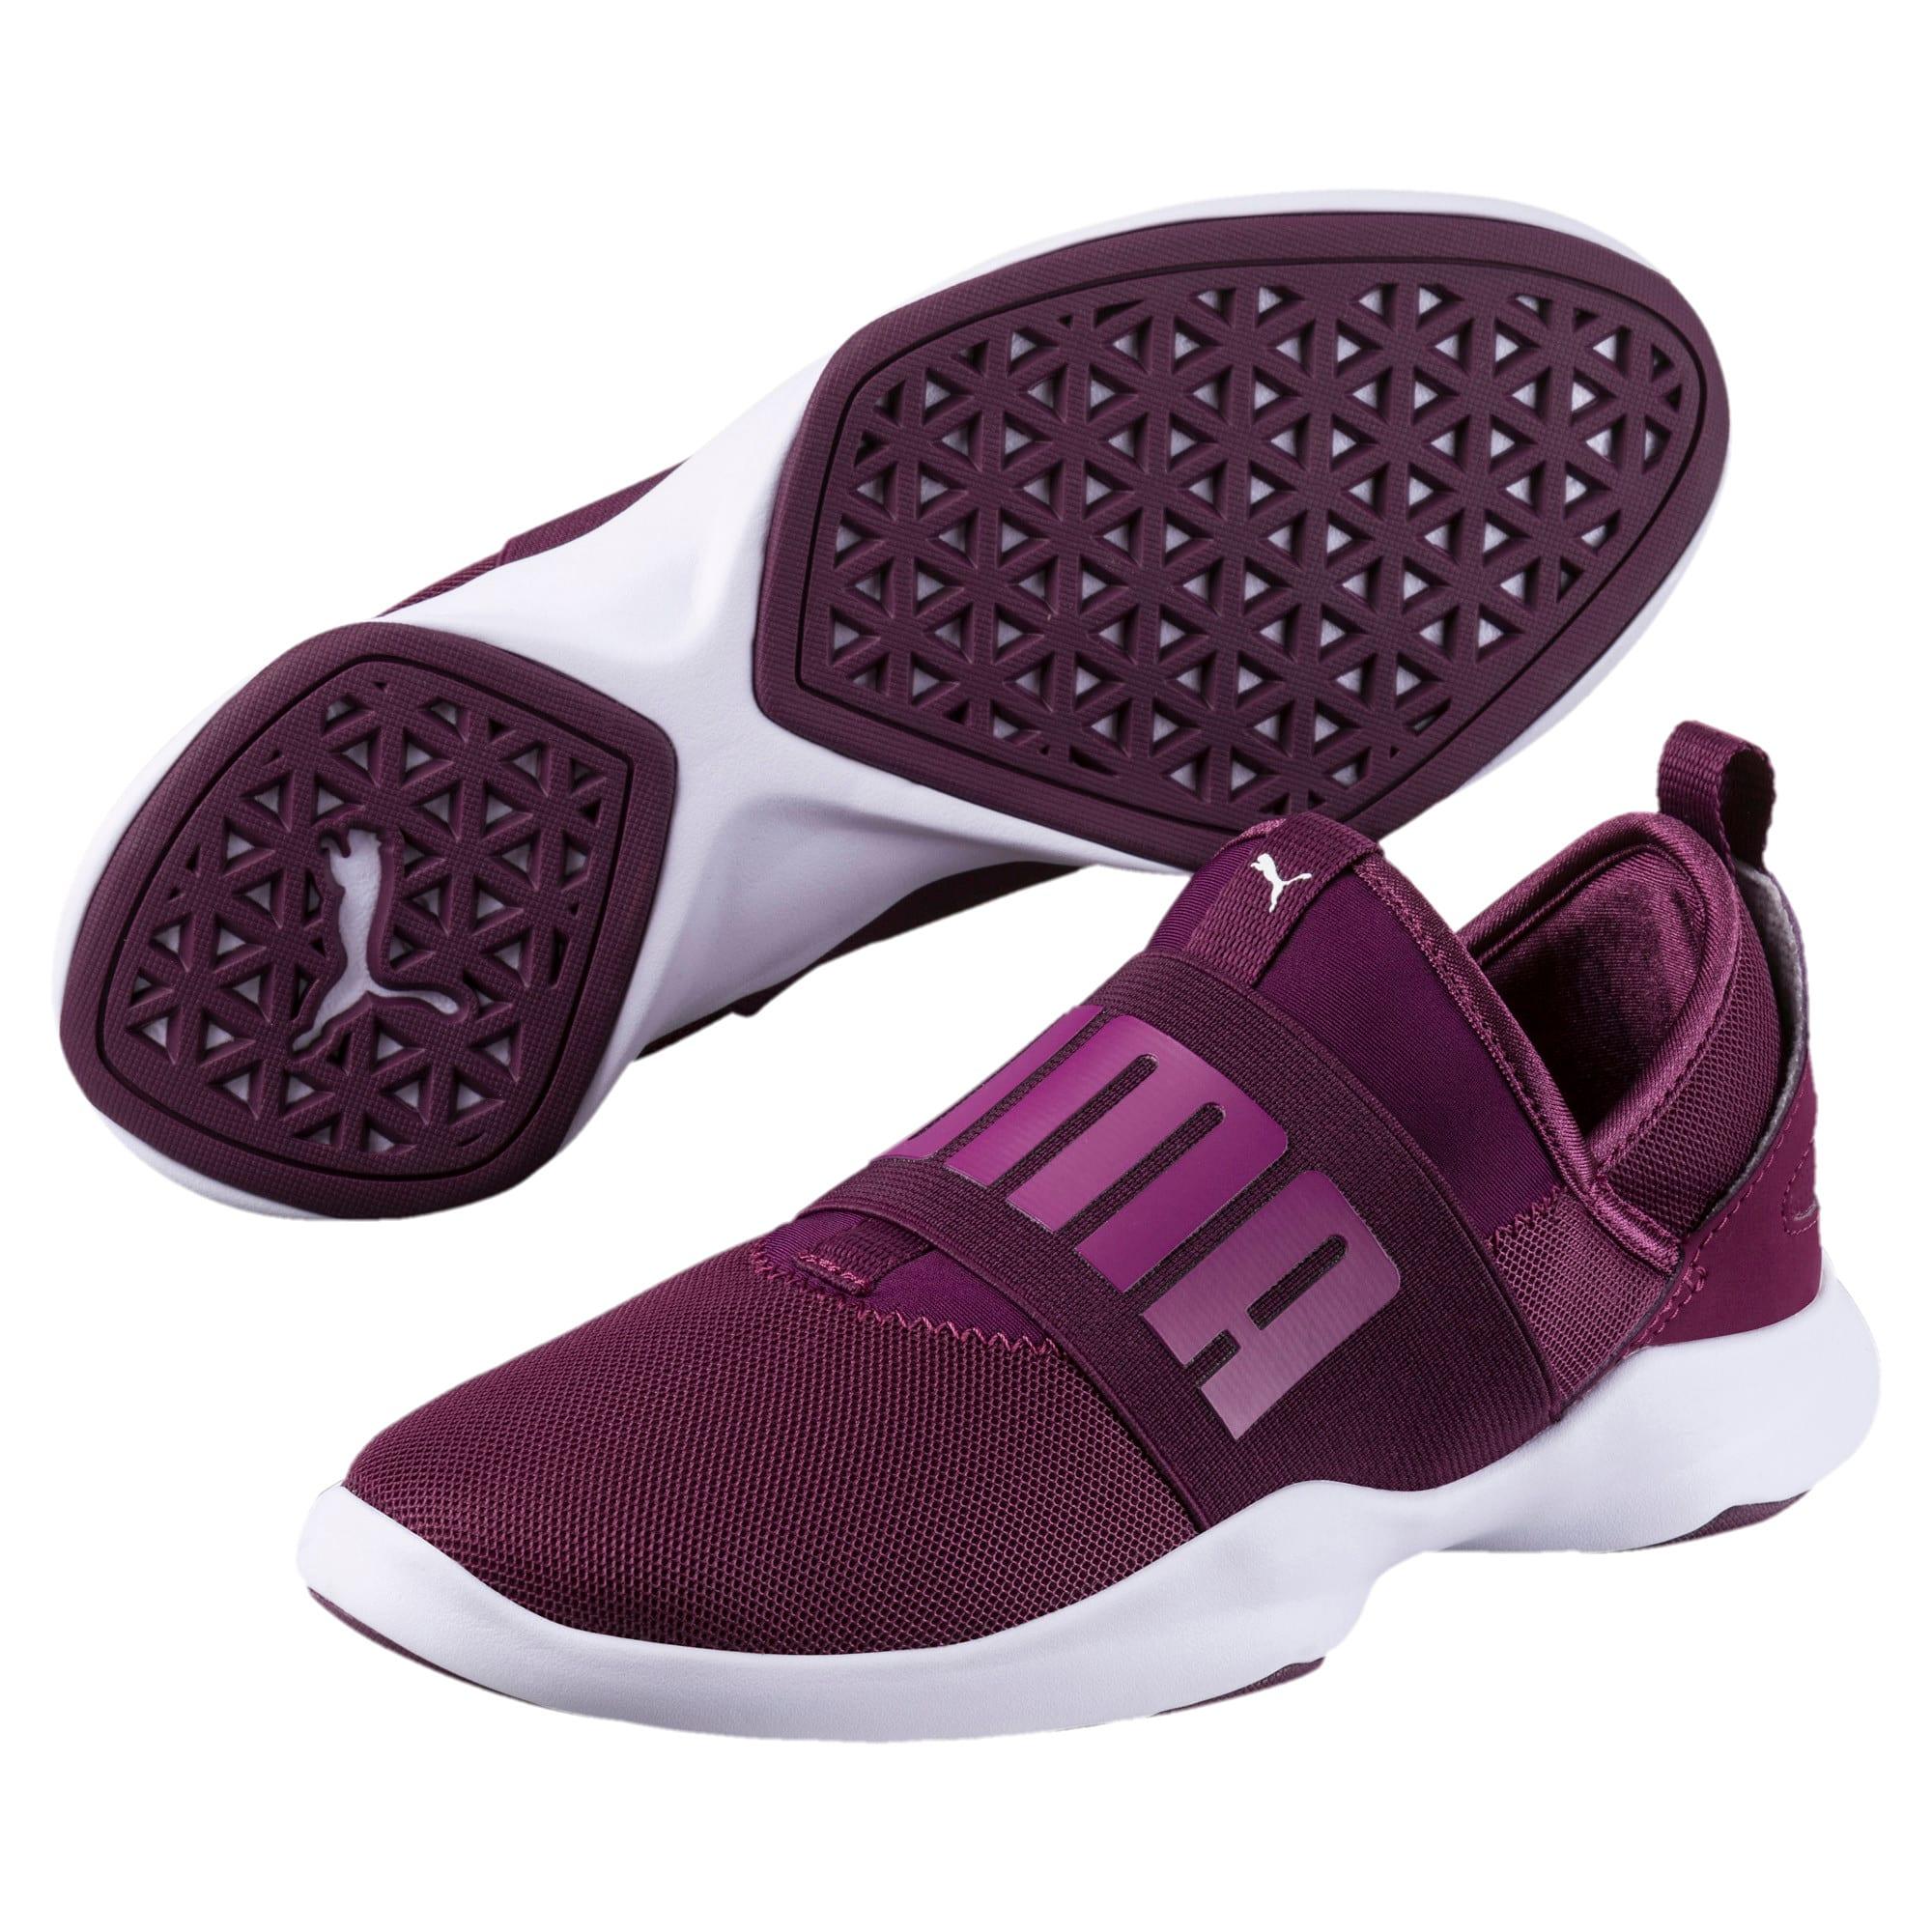 Thumbnail 2 of Dare Unisex Training Shoes, Dark Purple-Dark Purple, medium